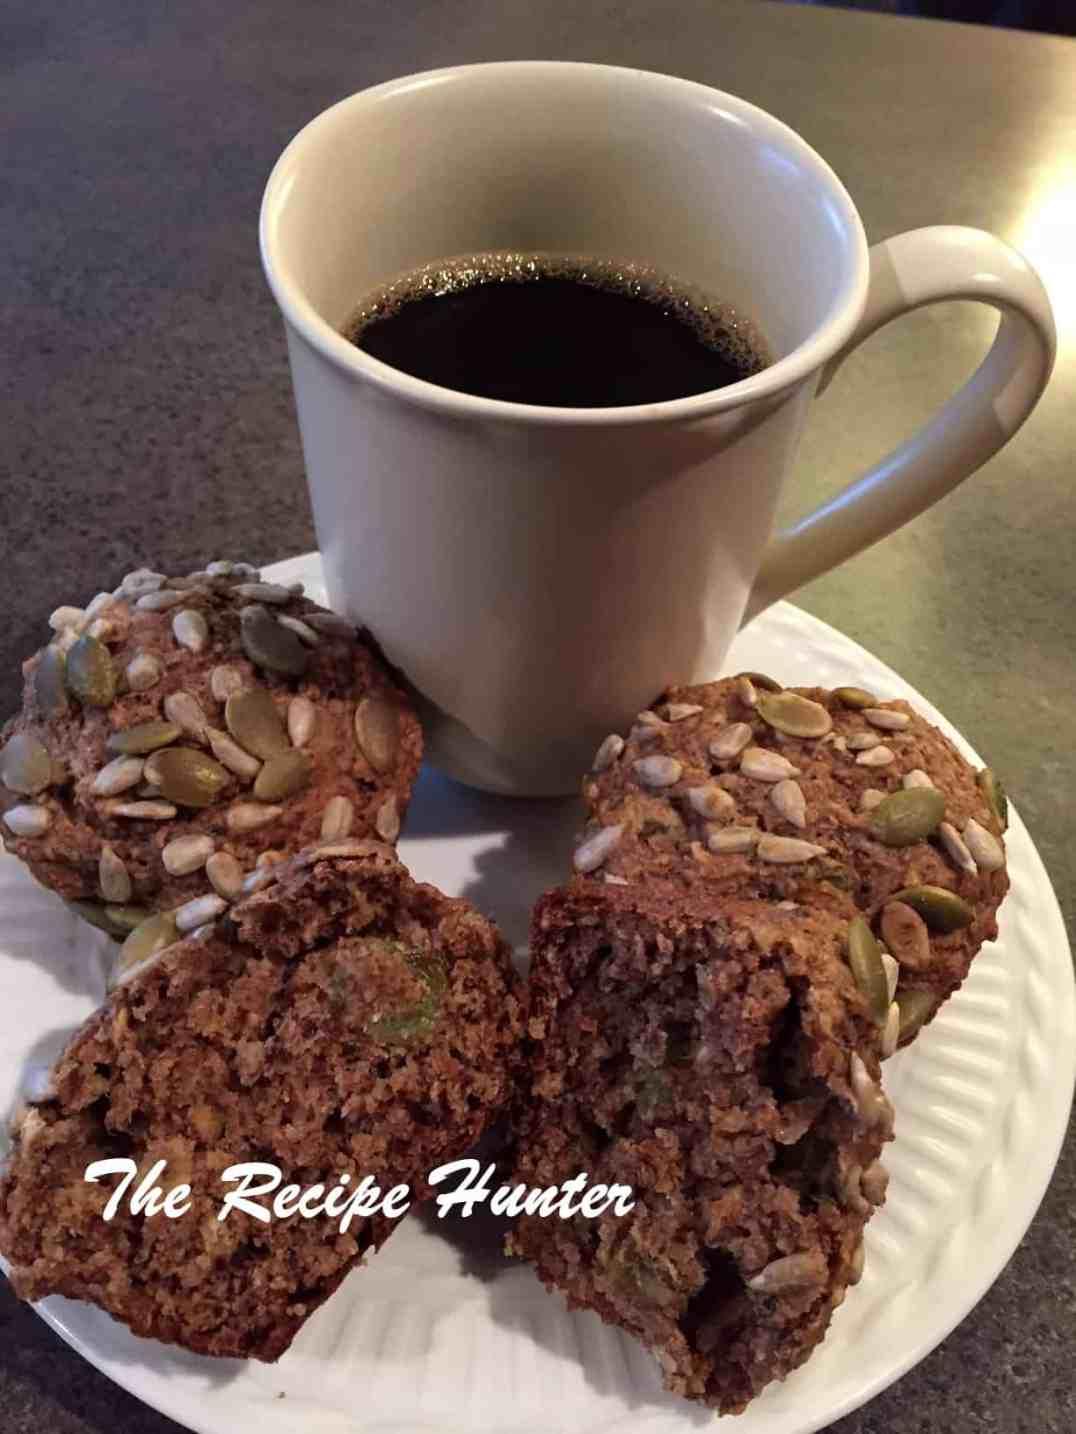 Surprise muffins